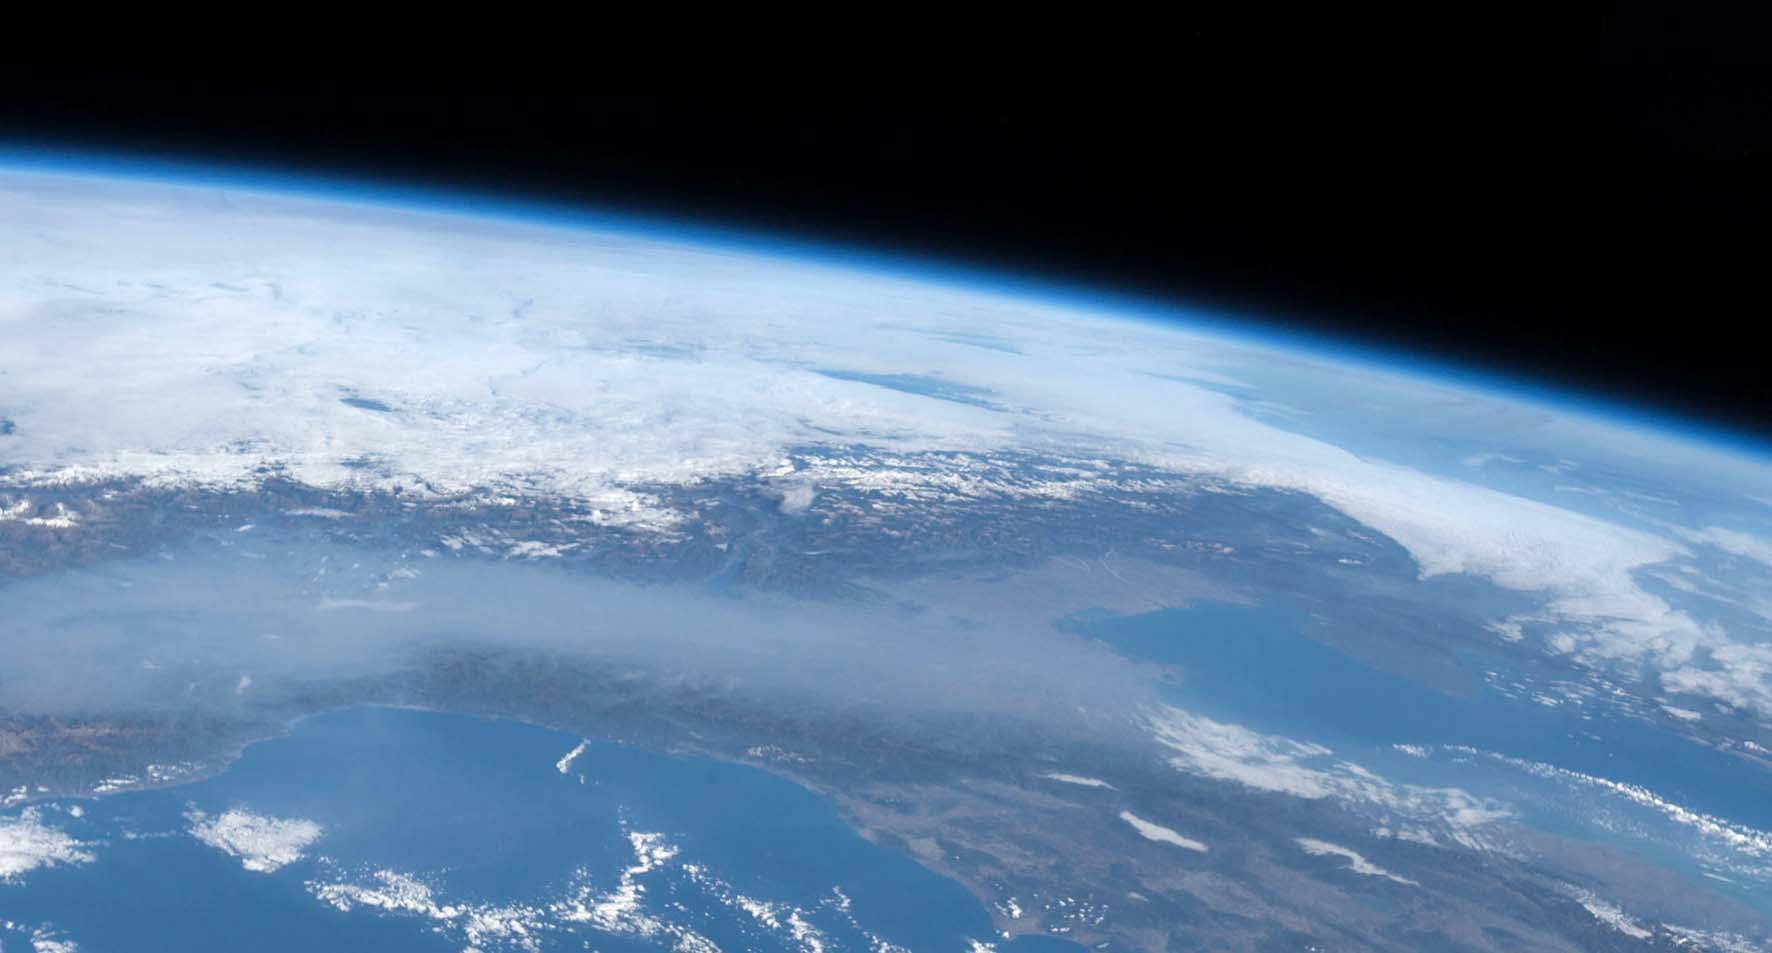 cala l'inquinamento atmosferico nella Pianura Padana italia dal satellite smog pianura padana 3